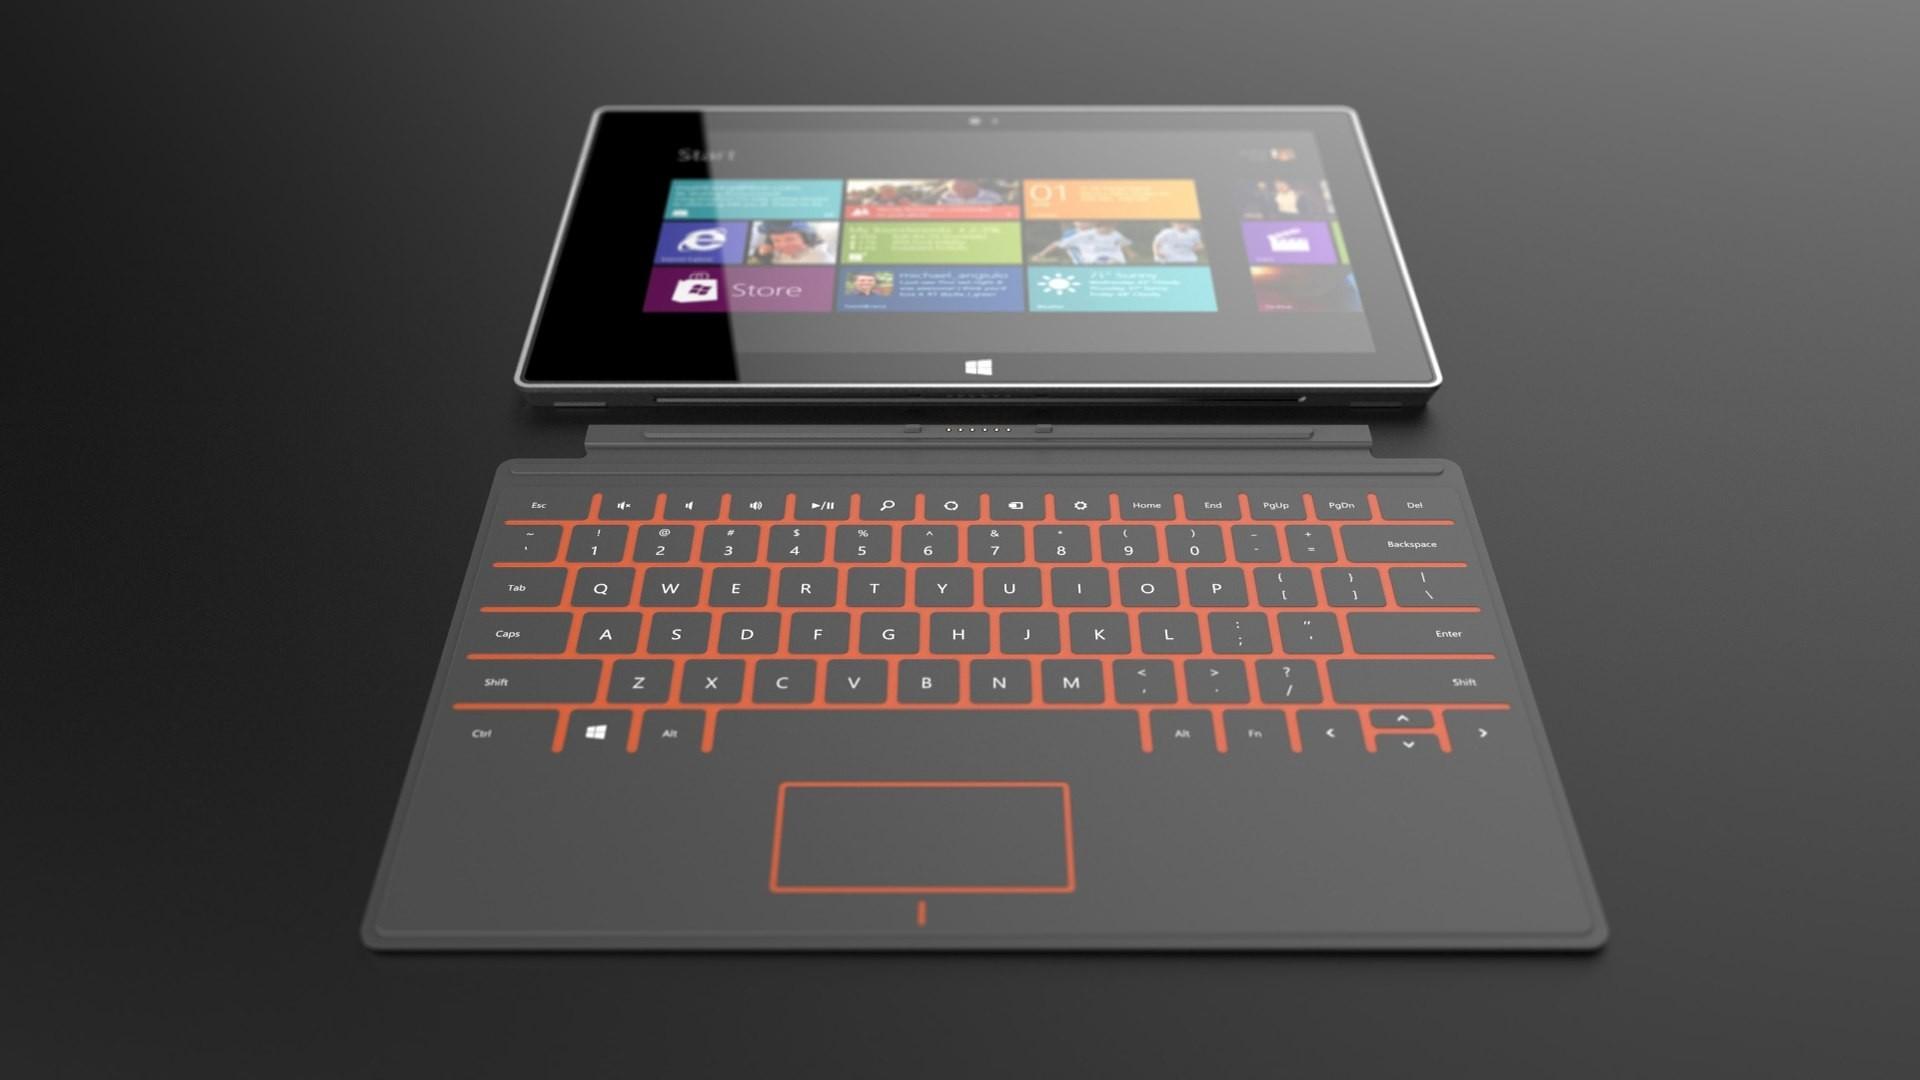 Microsoft Surface desktop PC and Mac wallpaper